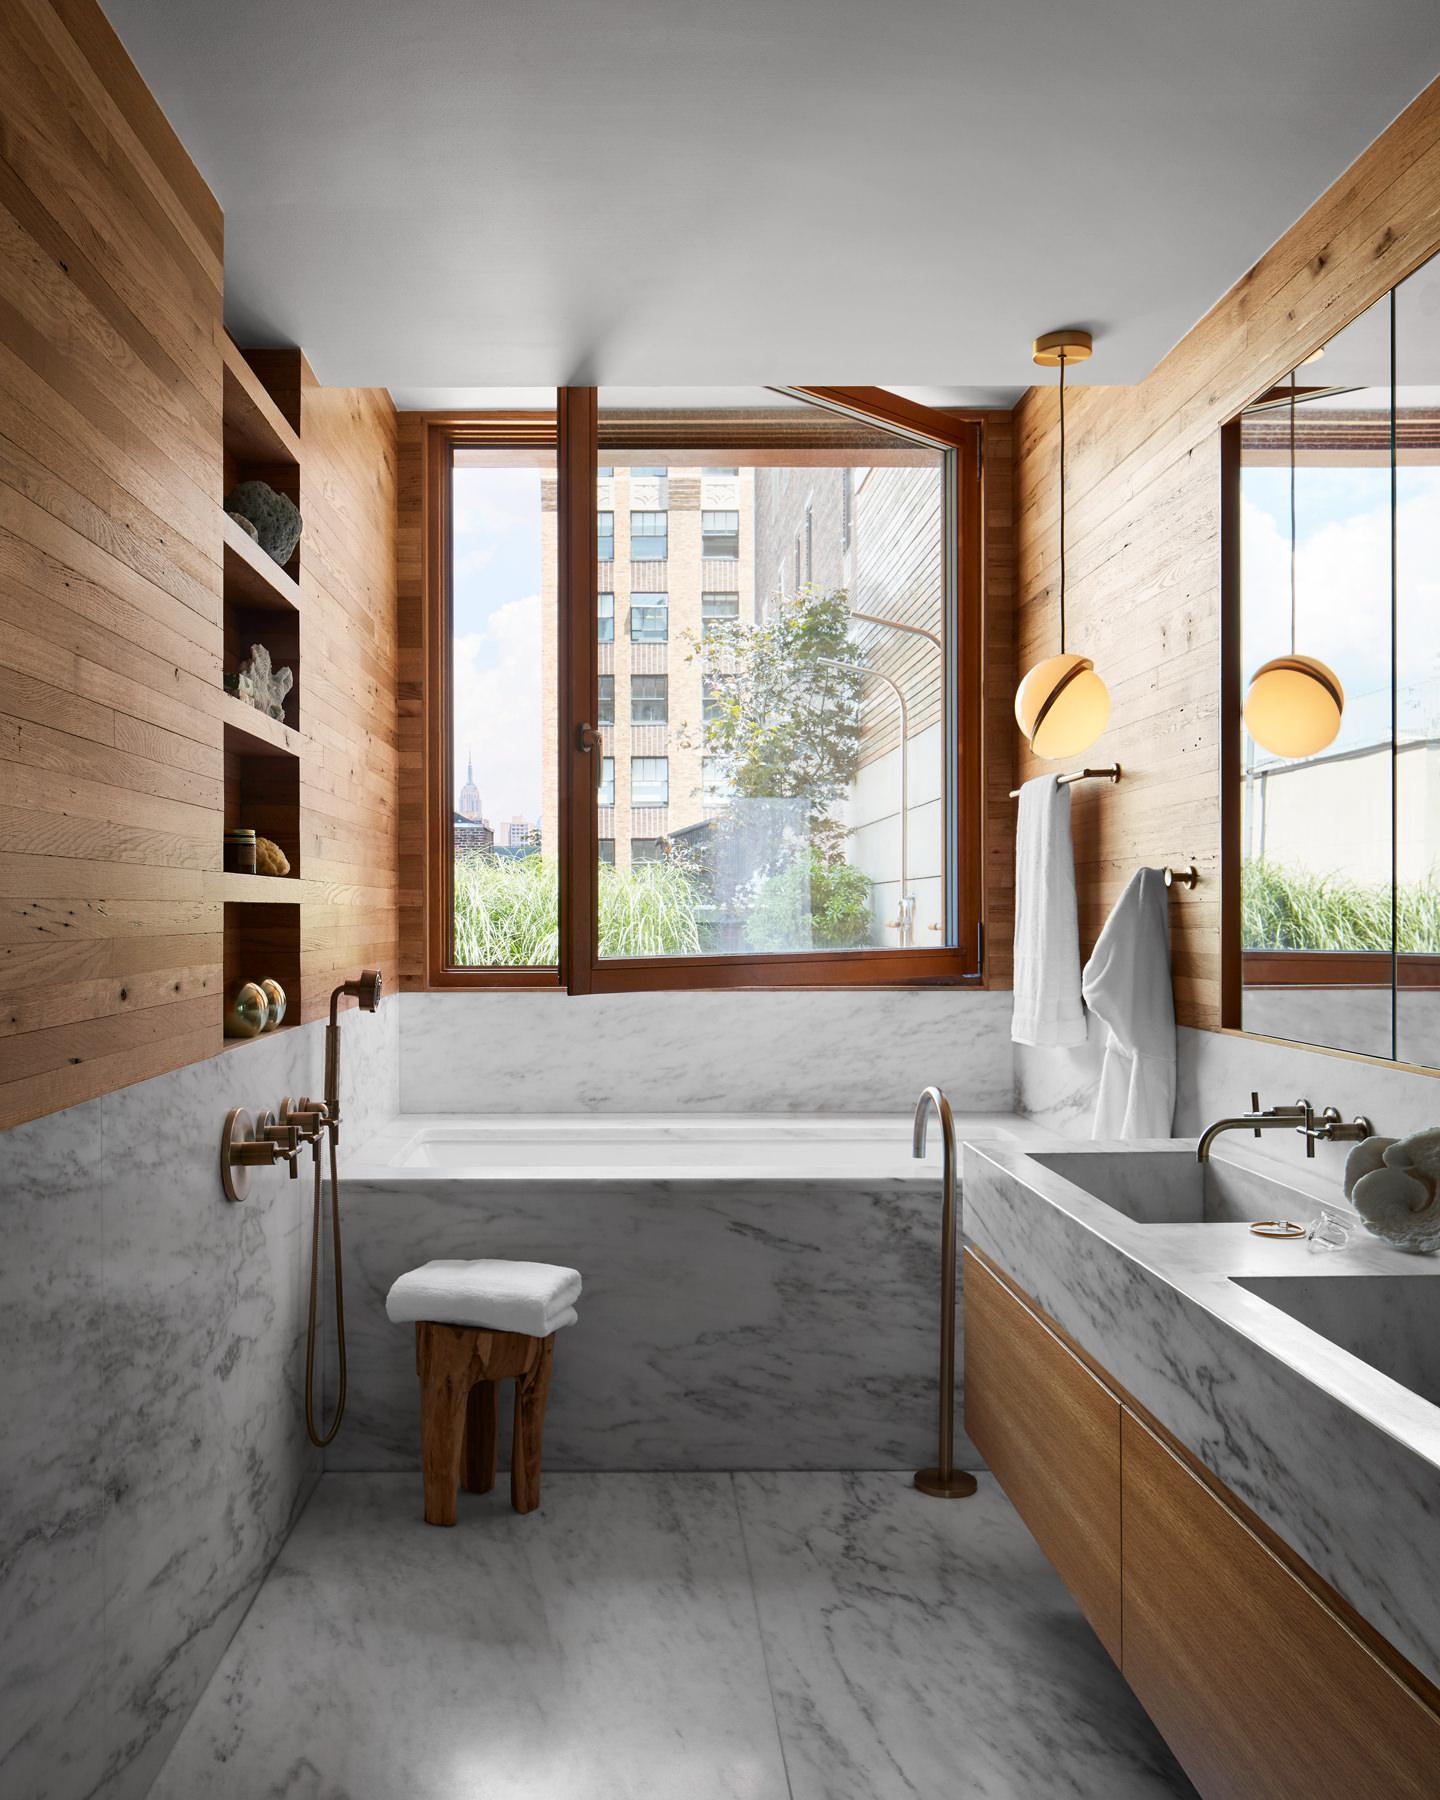 Lee Broom Penthouse New York Master Bathroom Photo Stephen Kent Johnson Yellowtrace 20